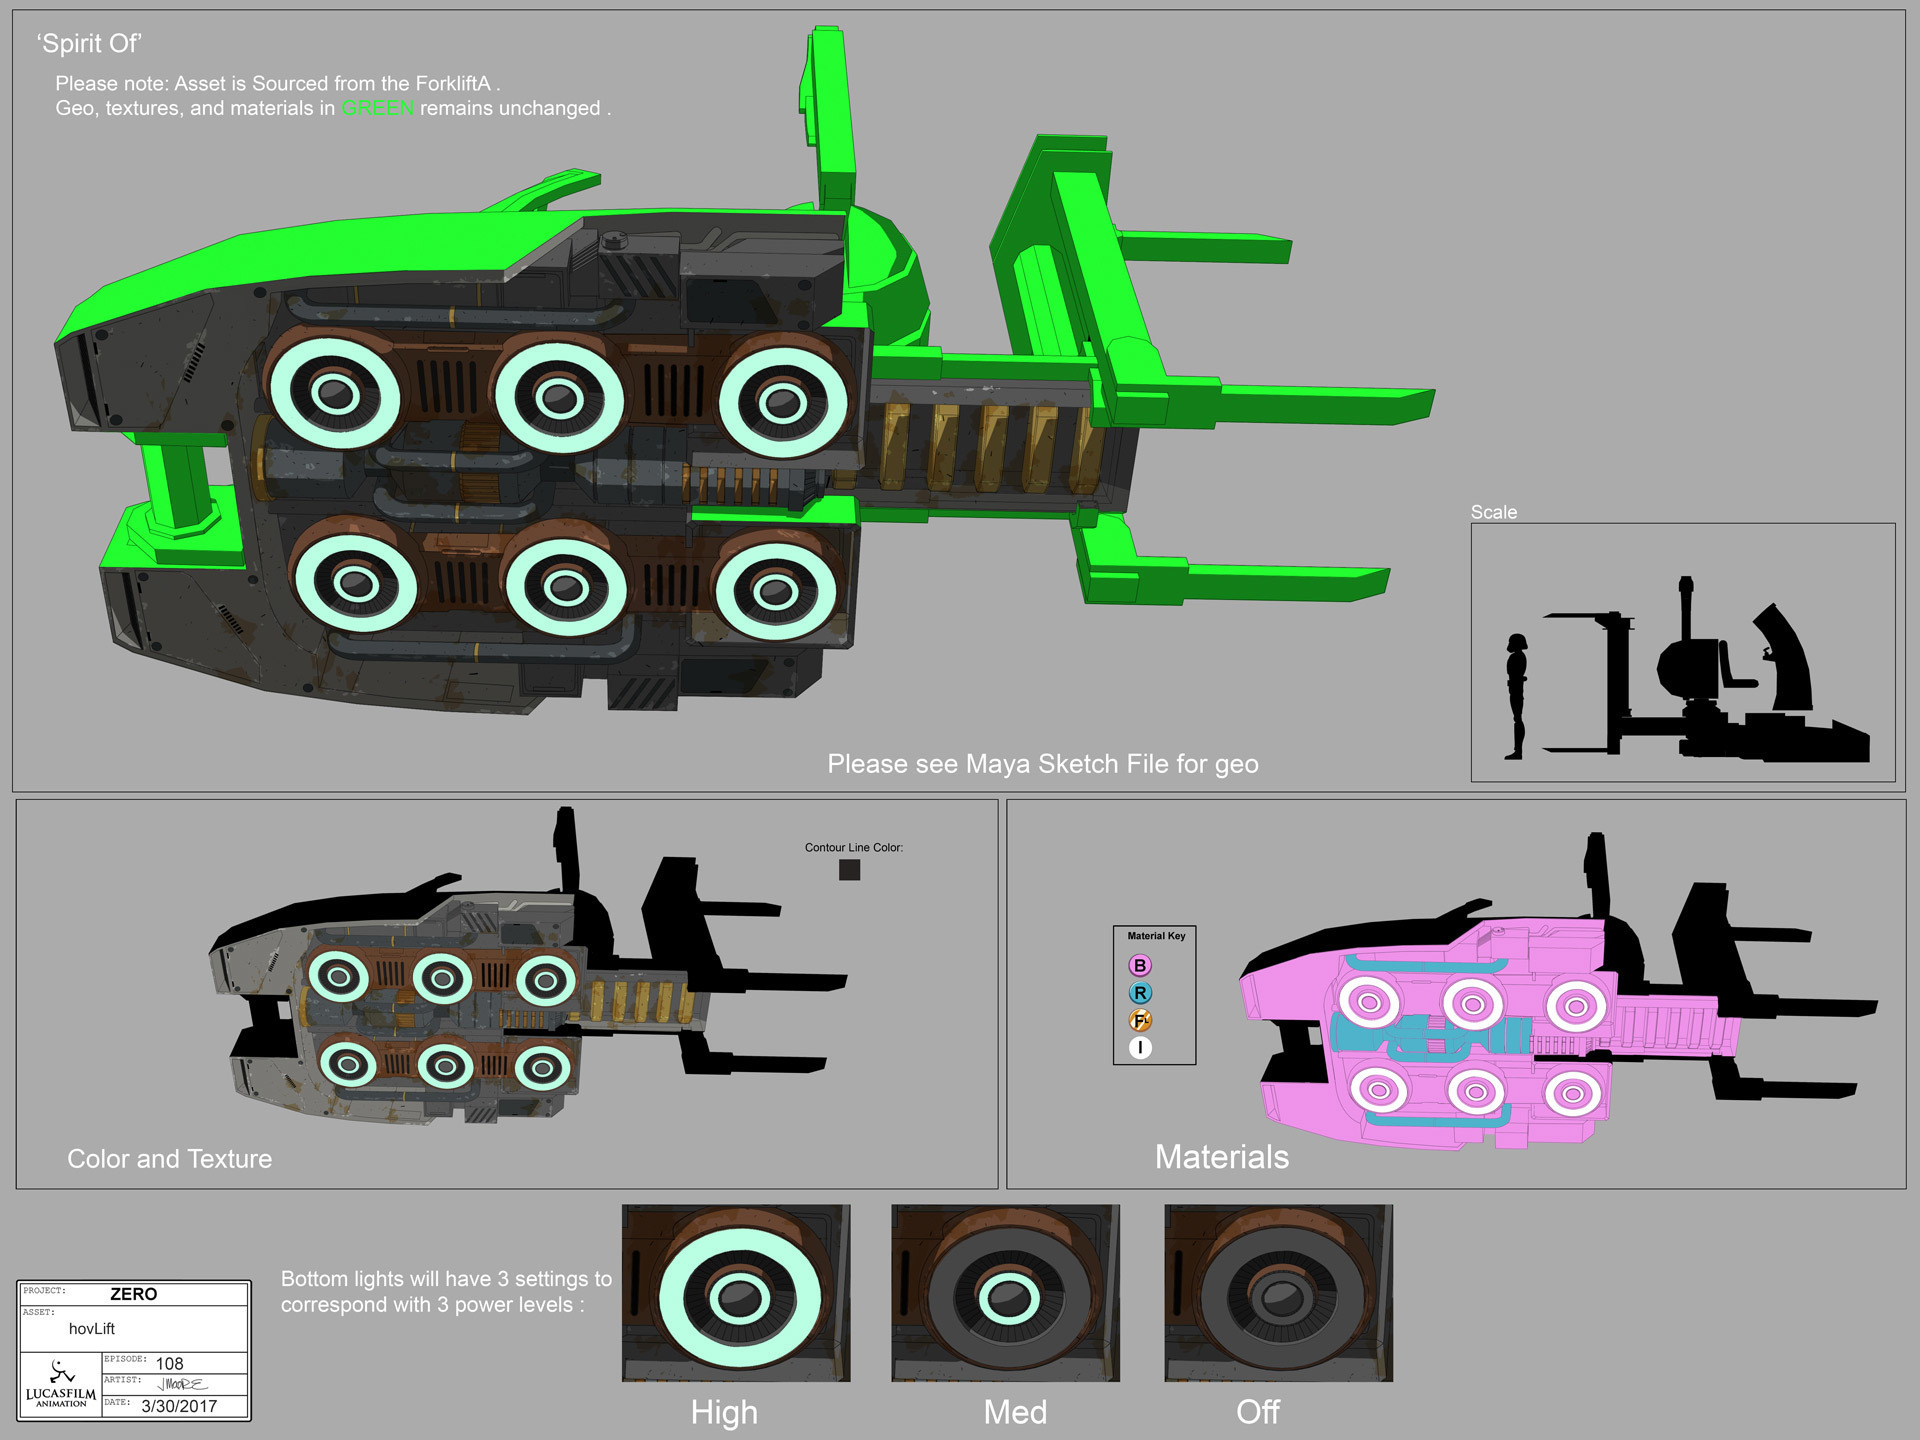 resistance-108-concept-art-gallery-6_f628c252.jpeg?region=0%2C0%2C1920%2C1440